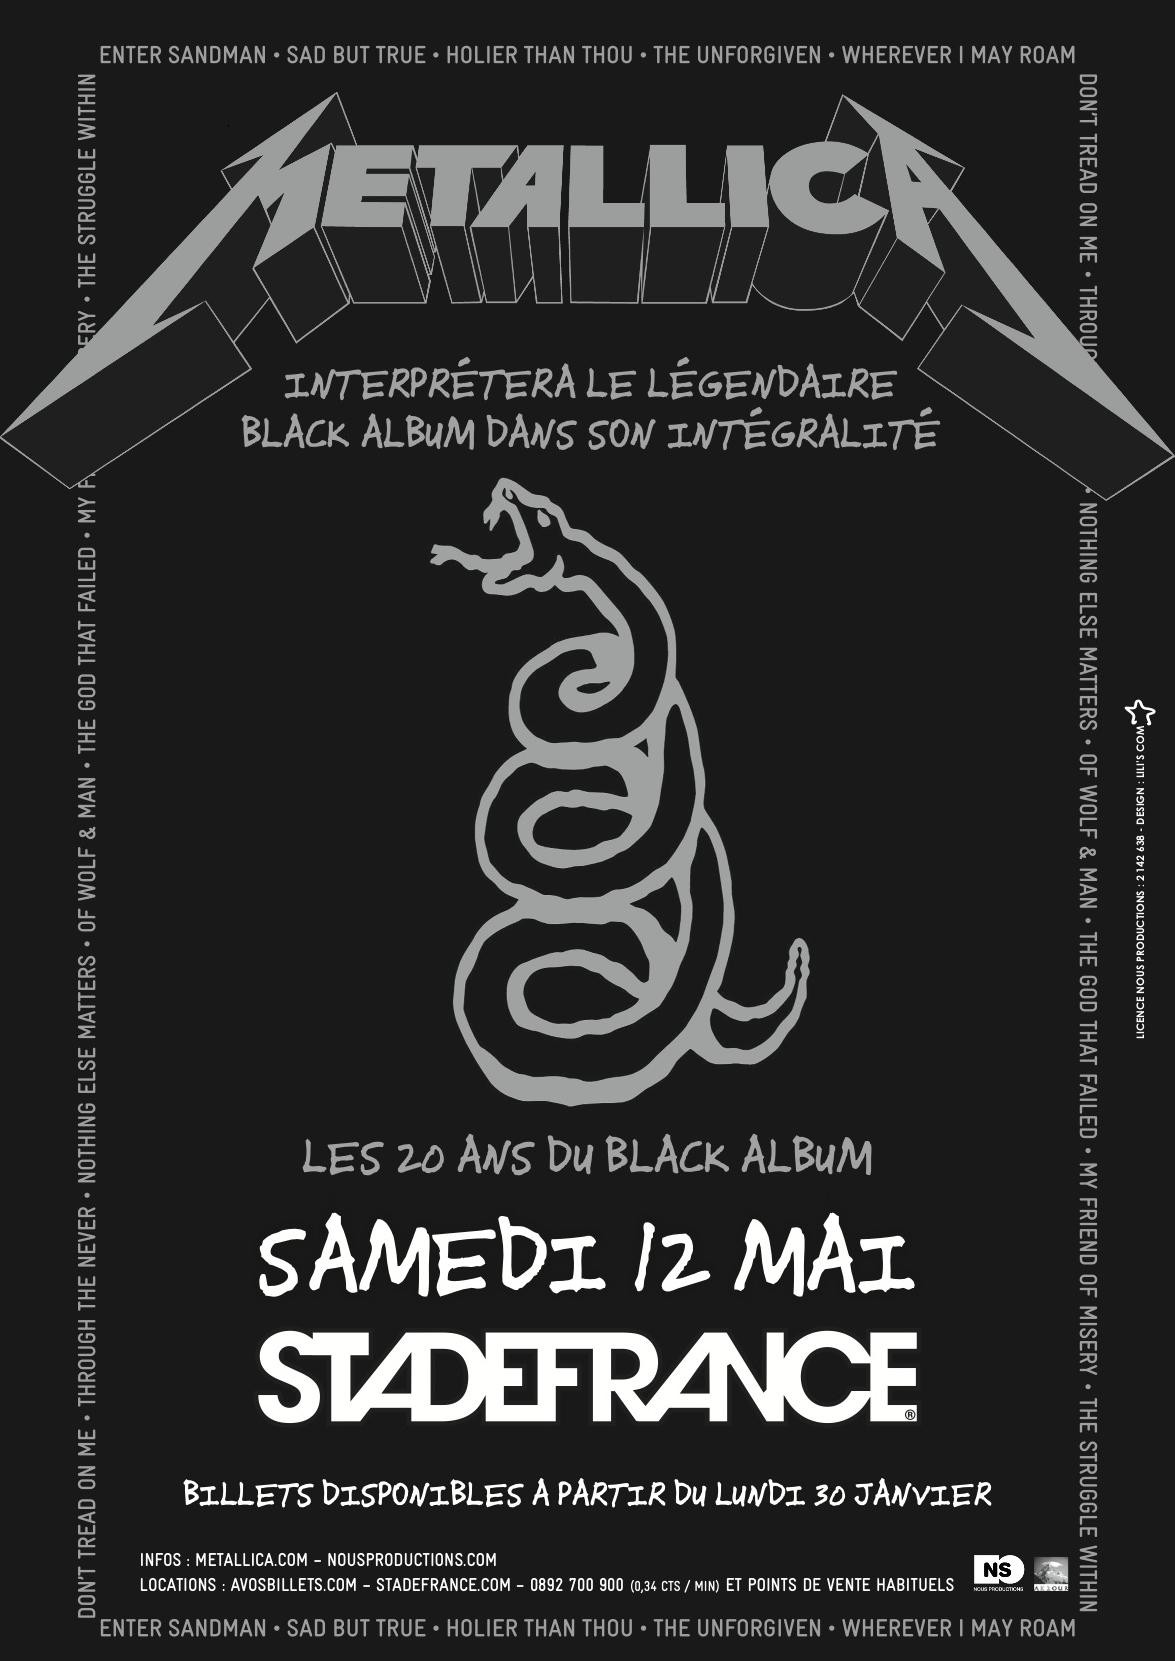 Metallica + The Kills + Gojira @ Stade de France (Paris), le 12 Mai 2012